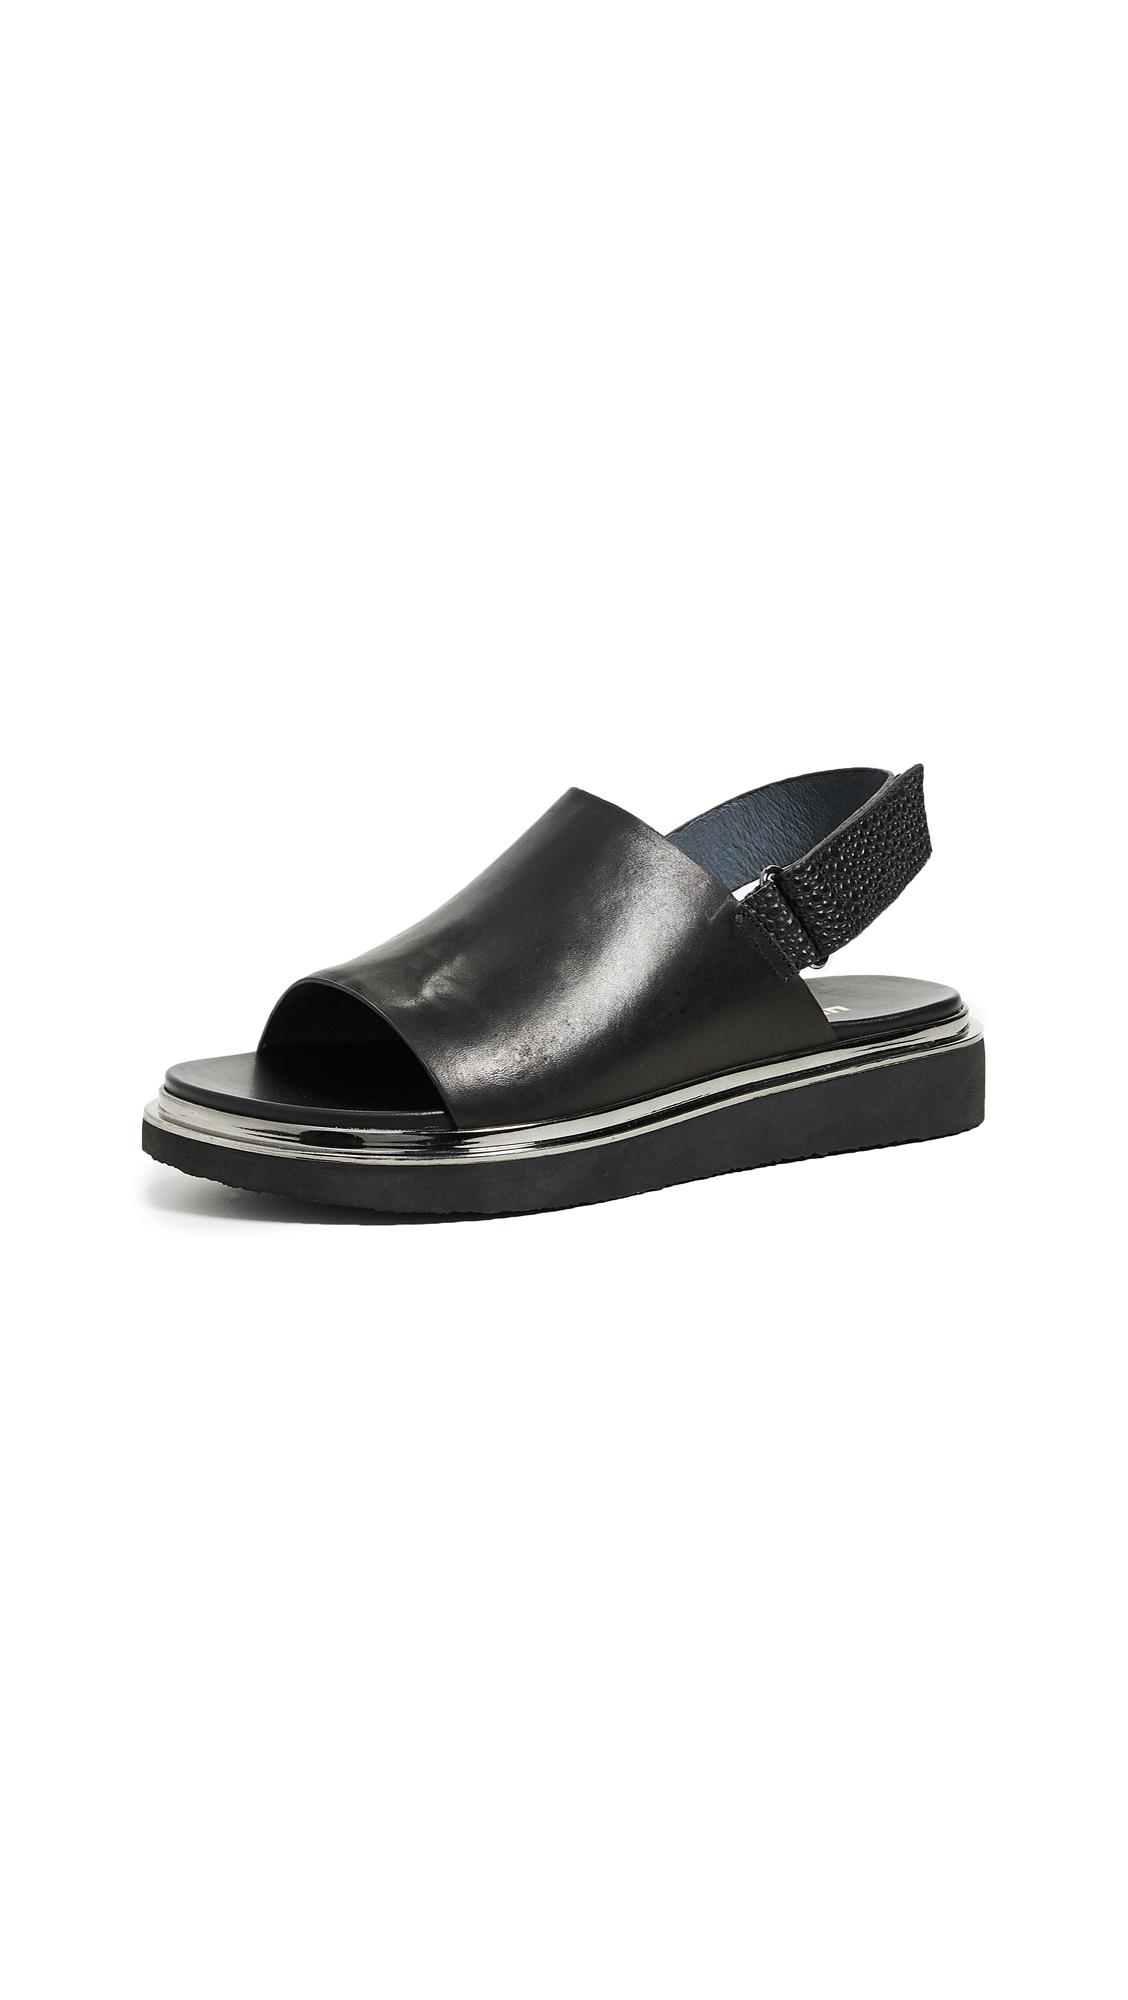 United Nude Terra Sandals - Black